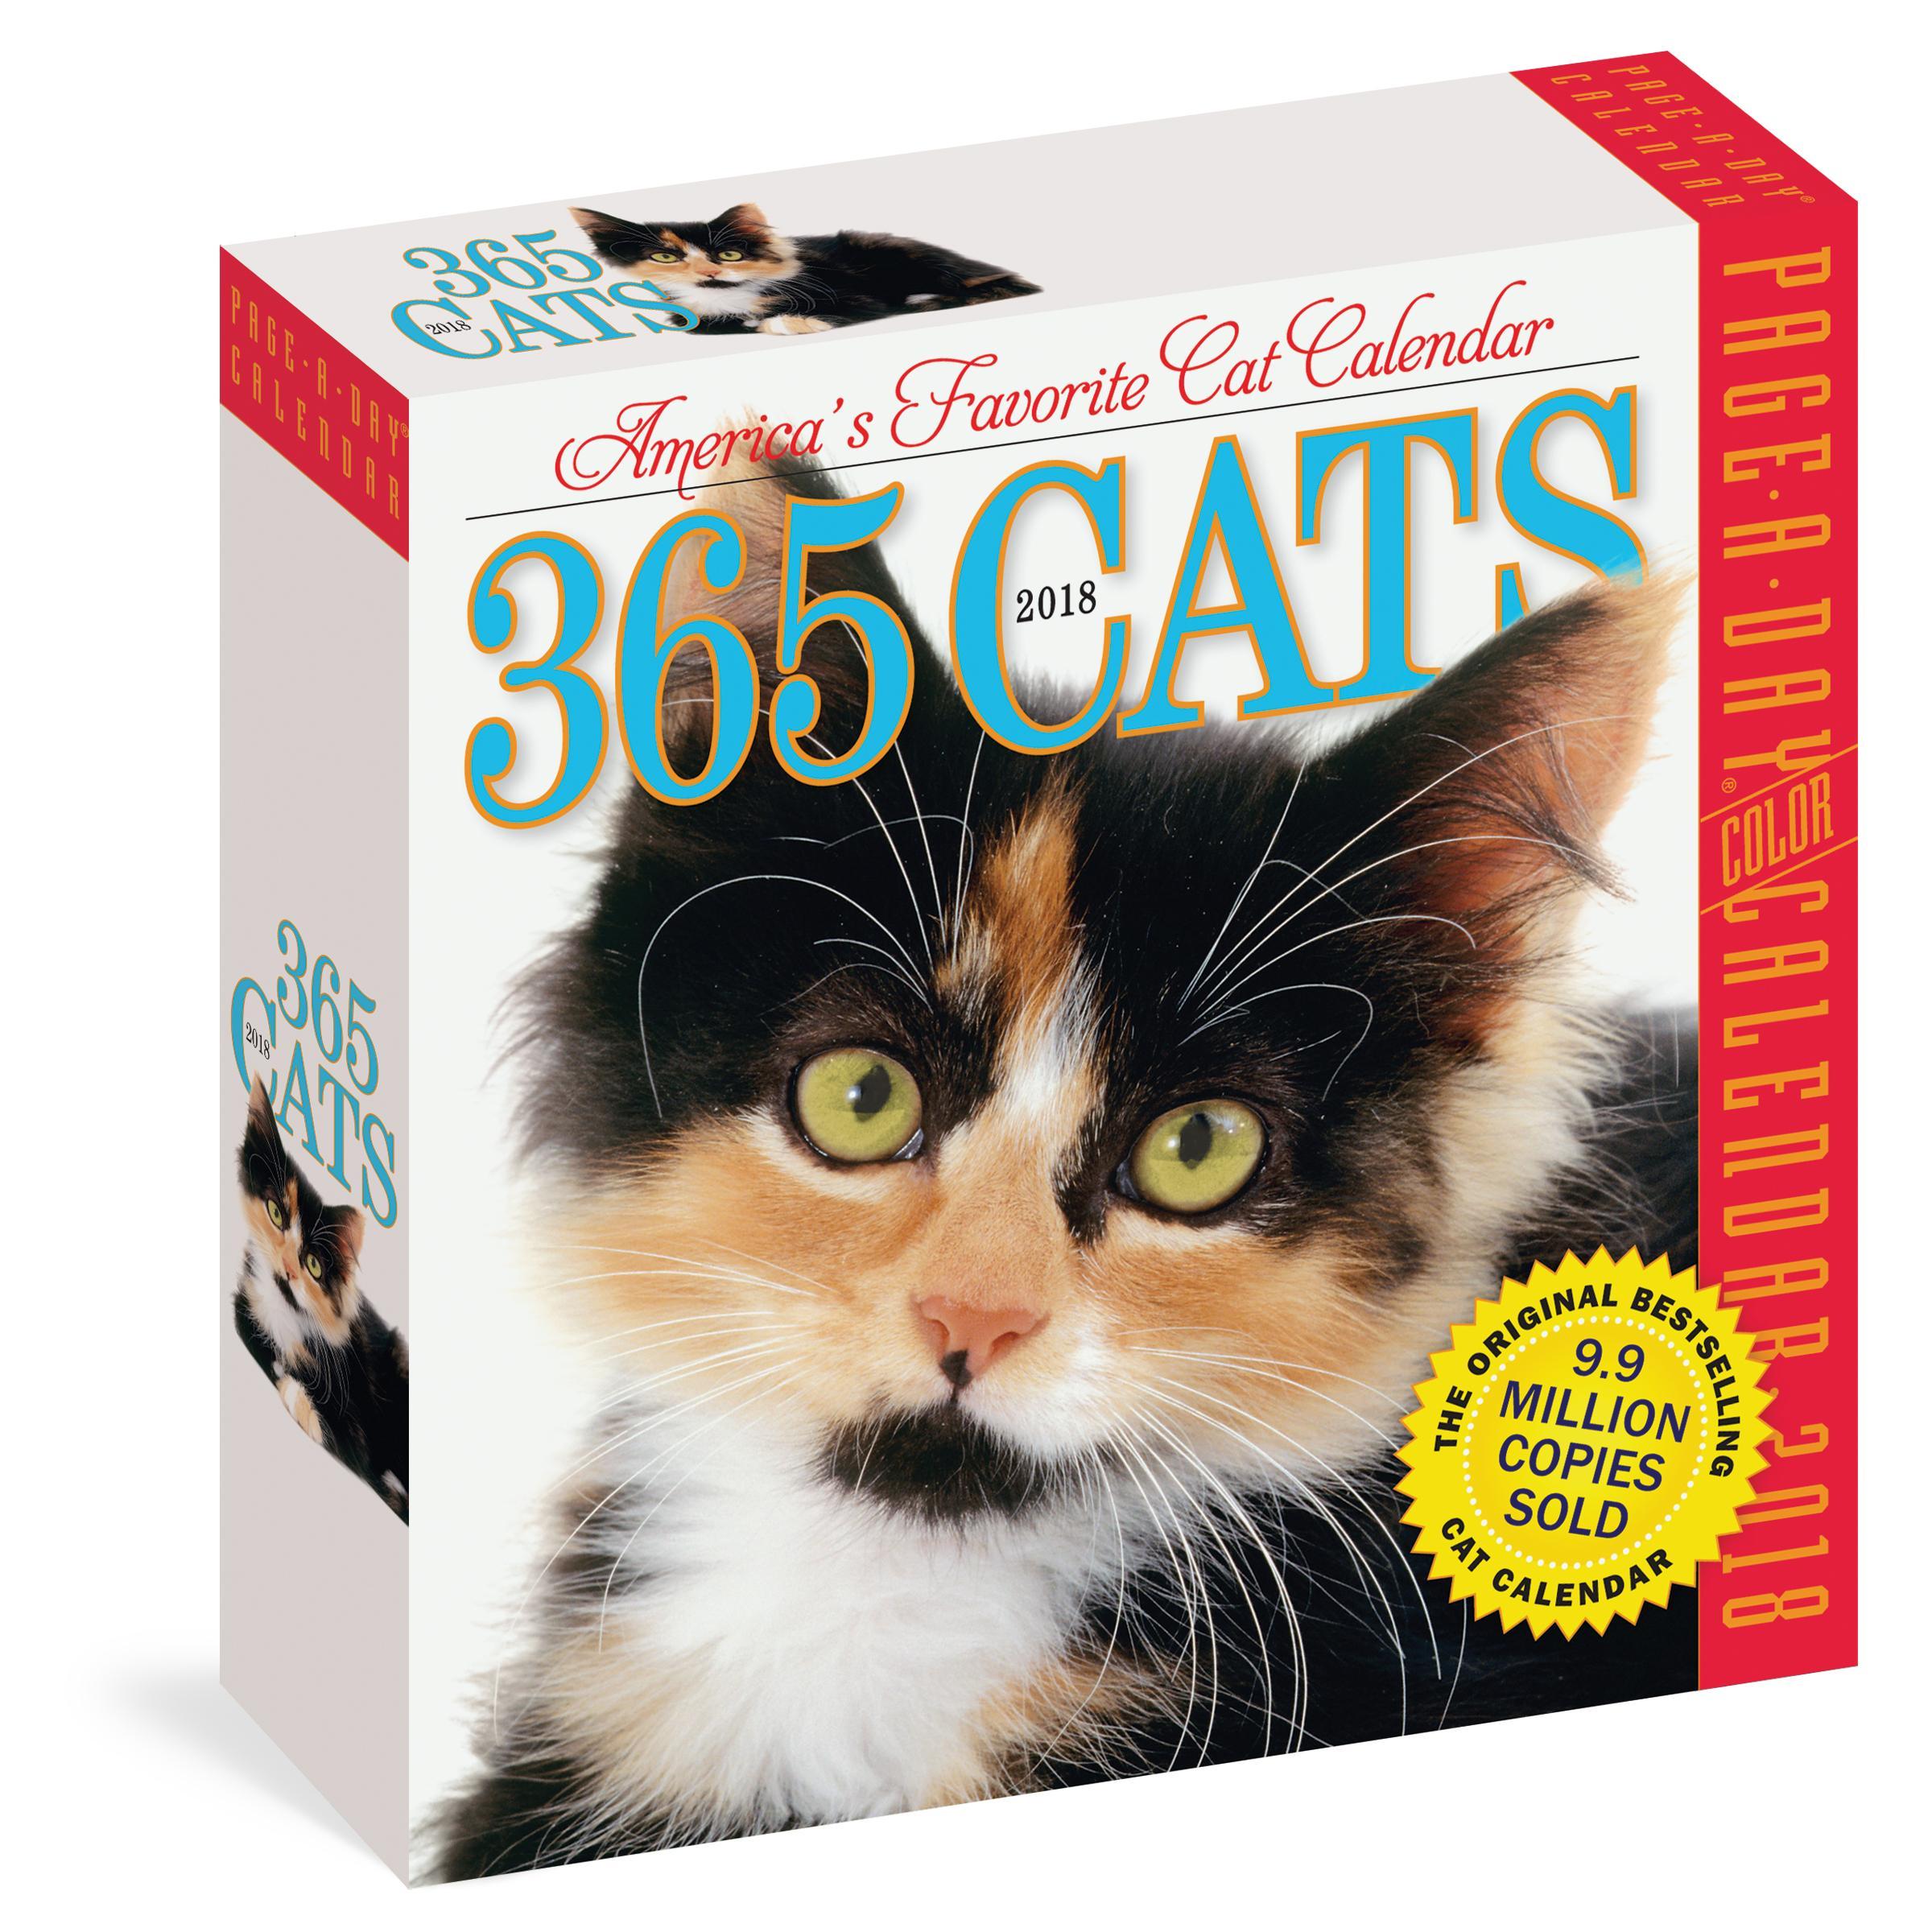 Amazon.com: 365 Cats Page-A-Day Calendar 2018